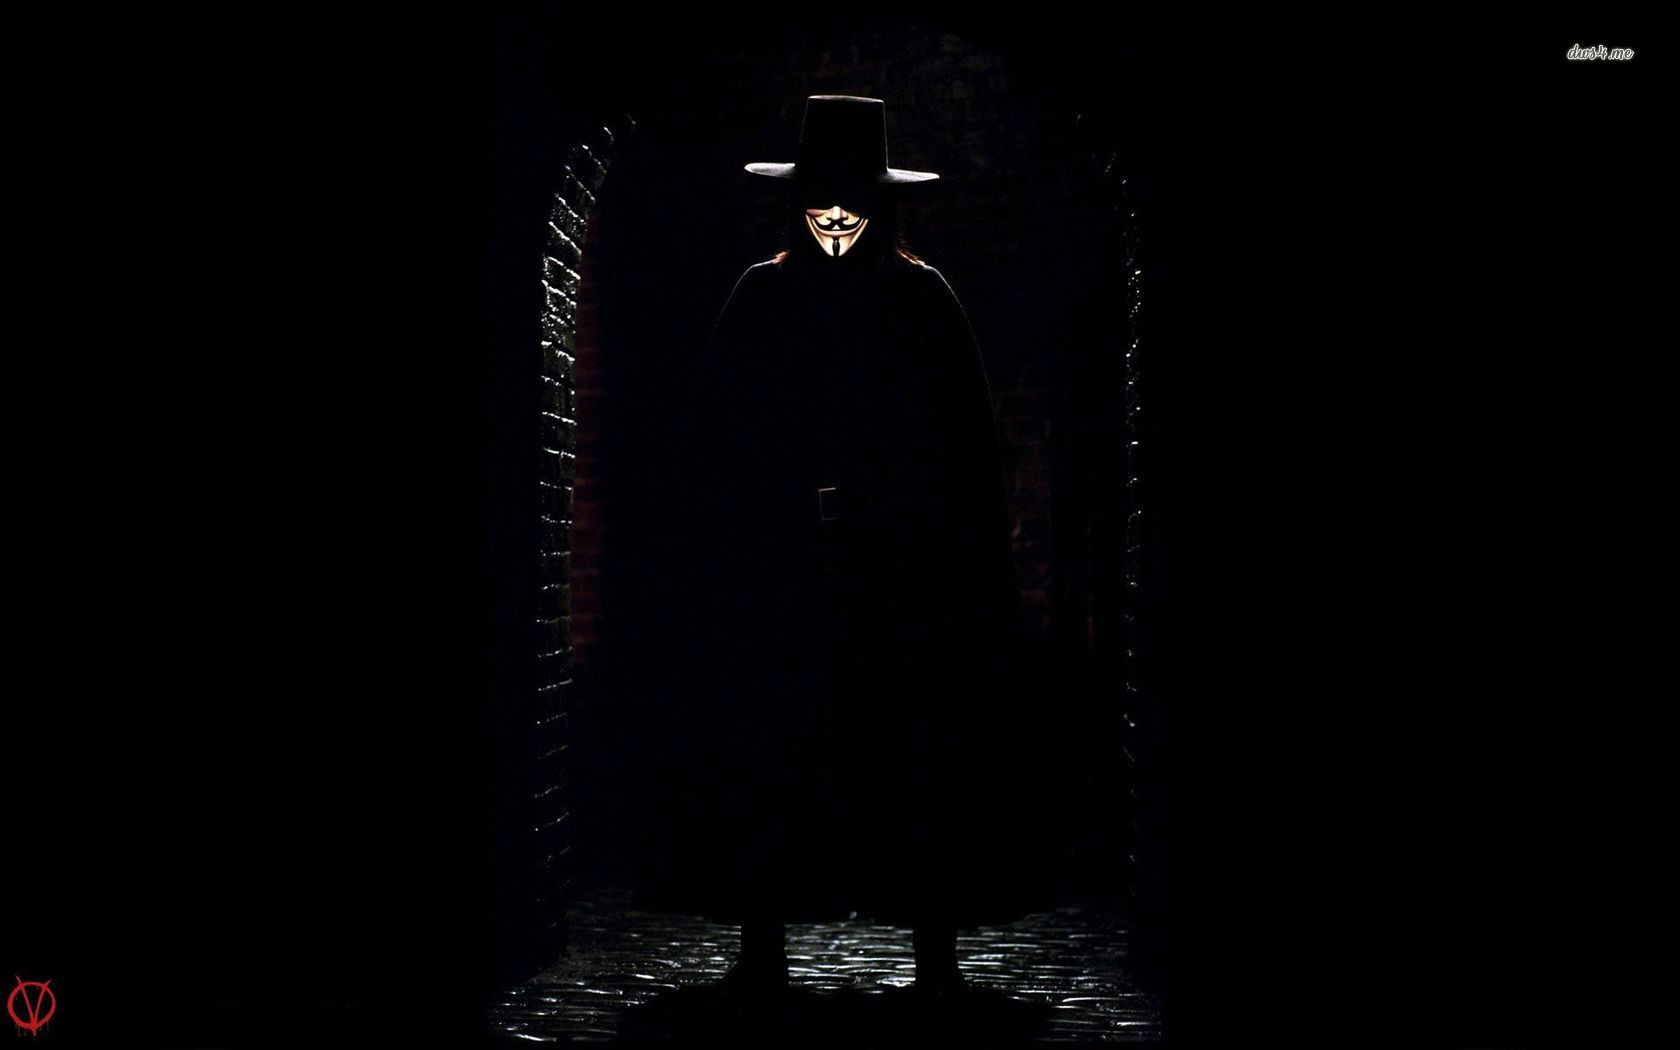 Scary V For Vendetta Q...V For Vendetta Movie Wallpaper